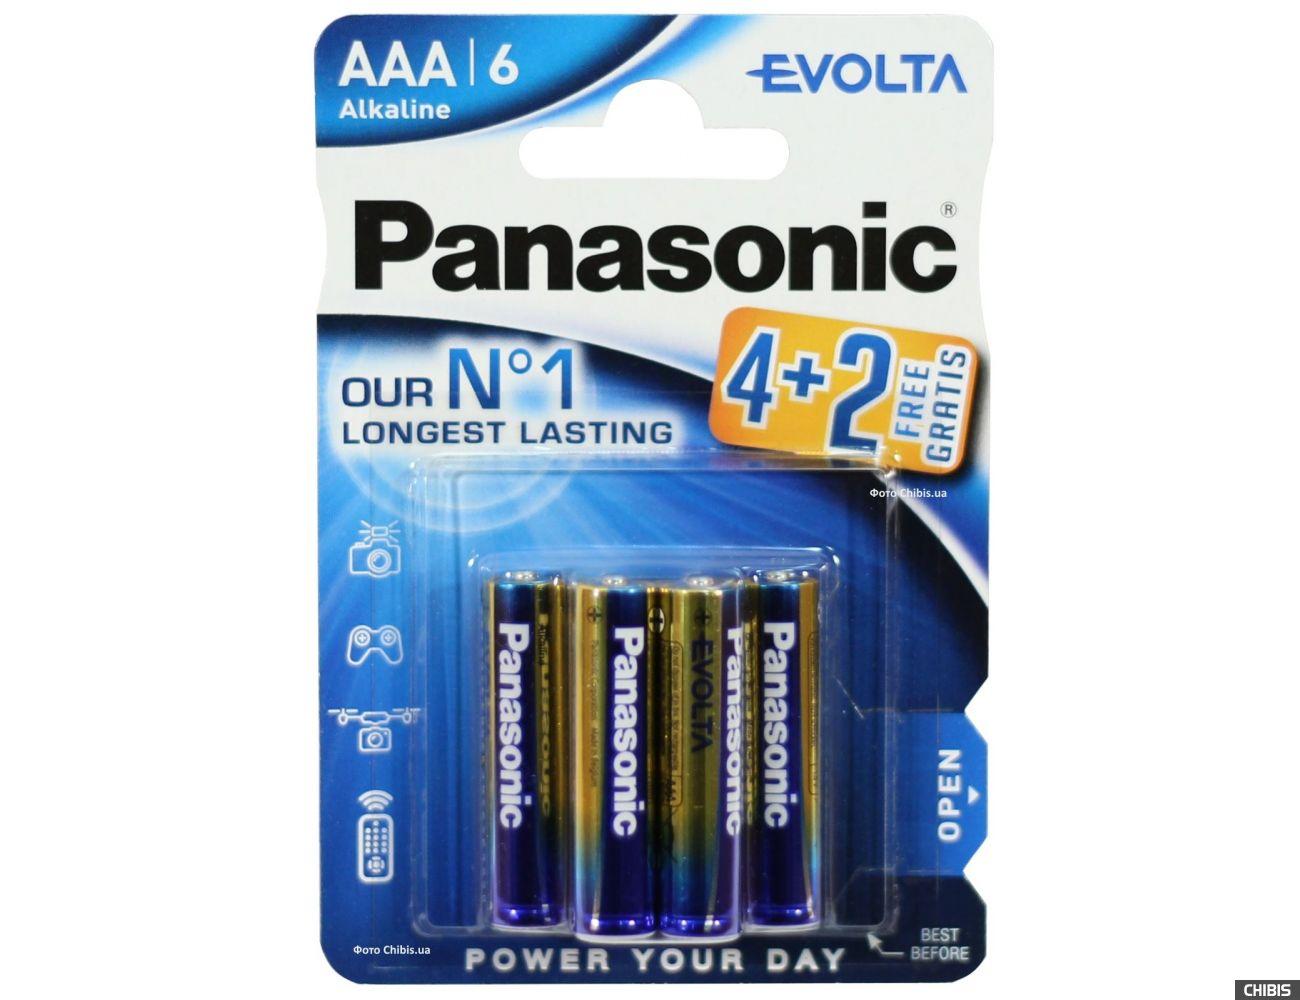 Батарейка ААА Panasonic Evolta LR03 1.5V Alkaline 4+2 бесплатно блистер 6 шт.